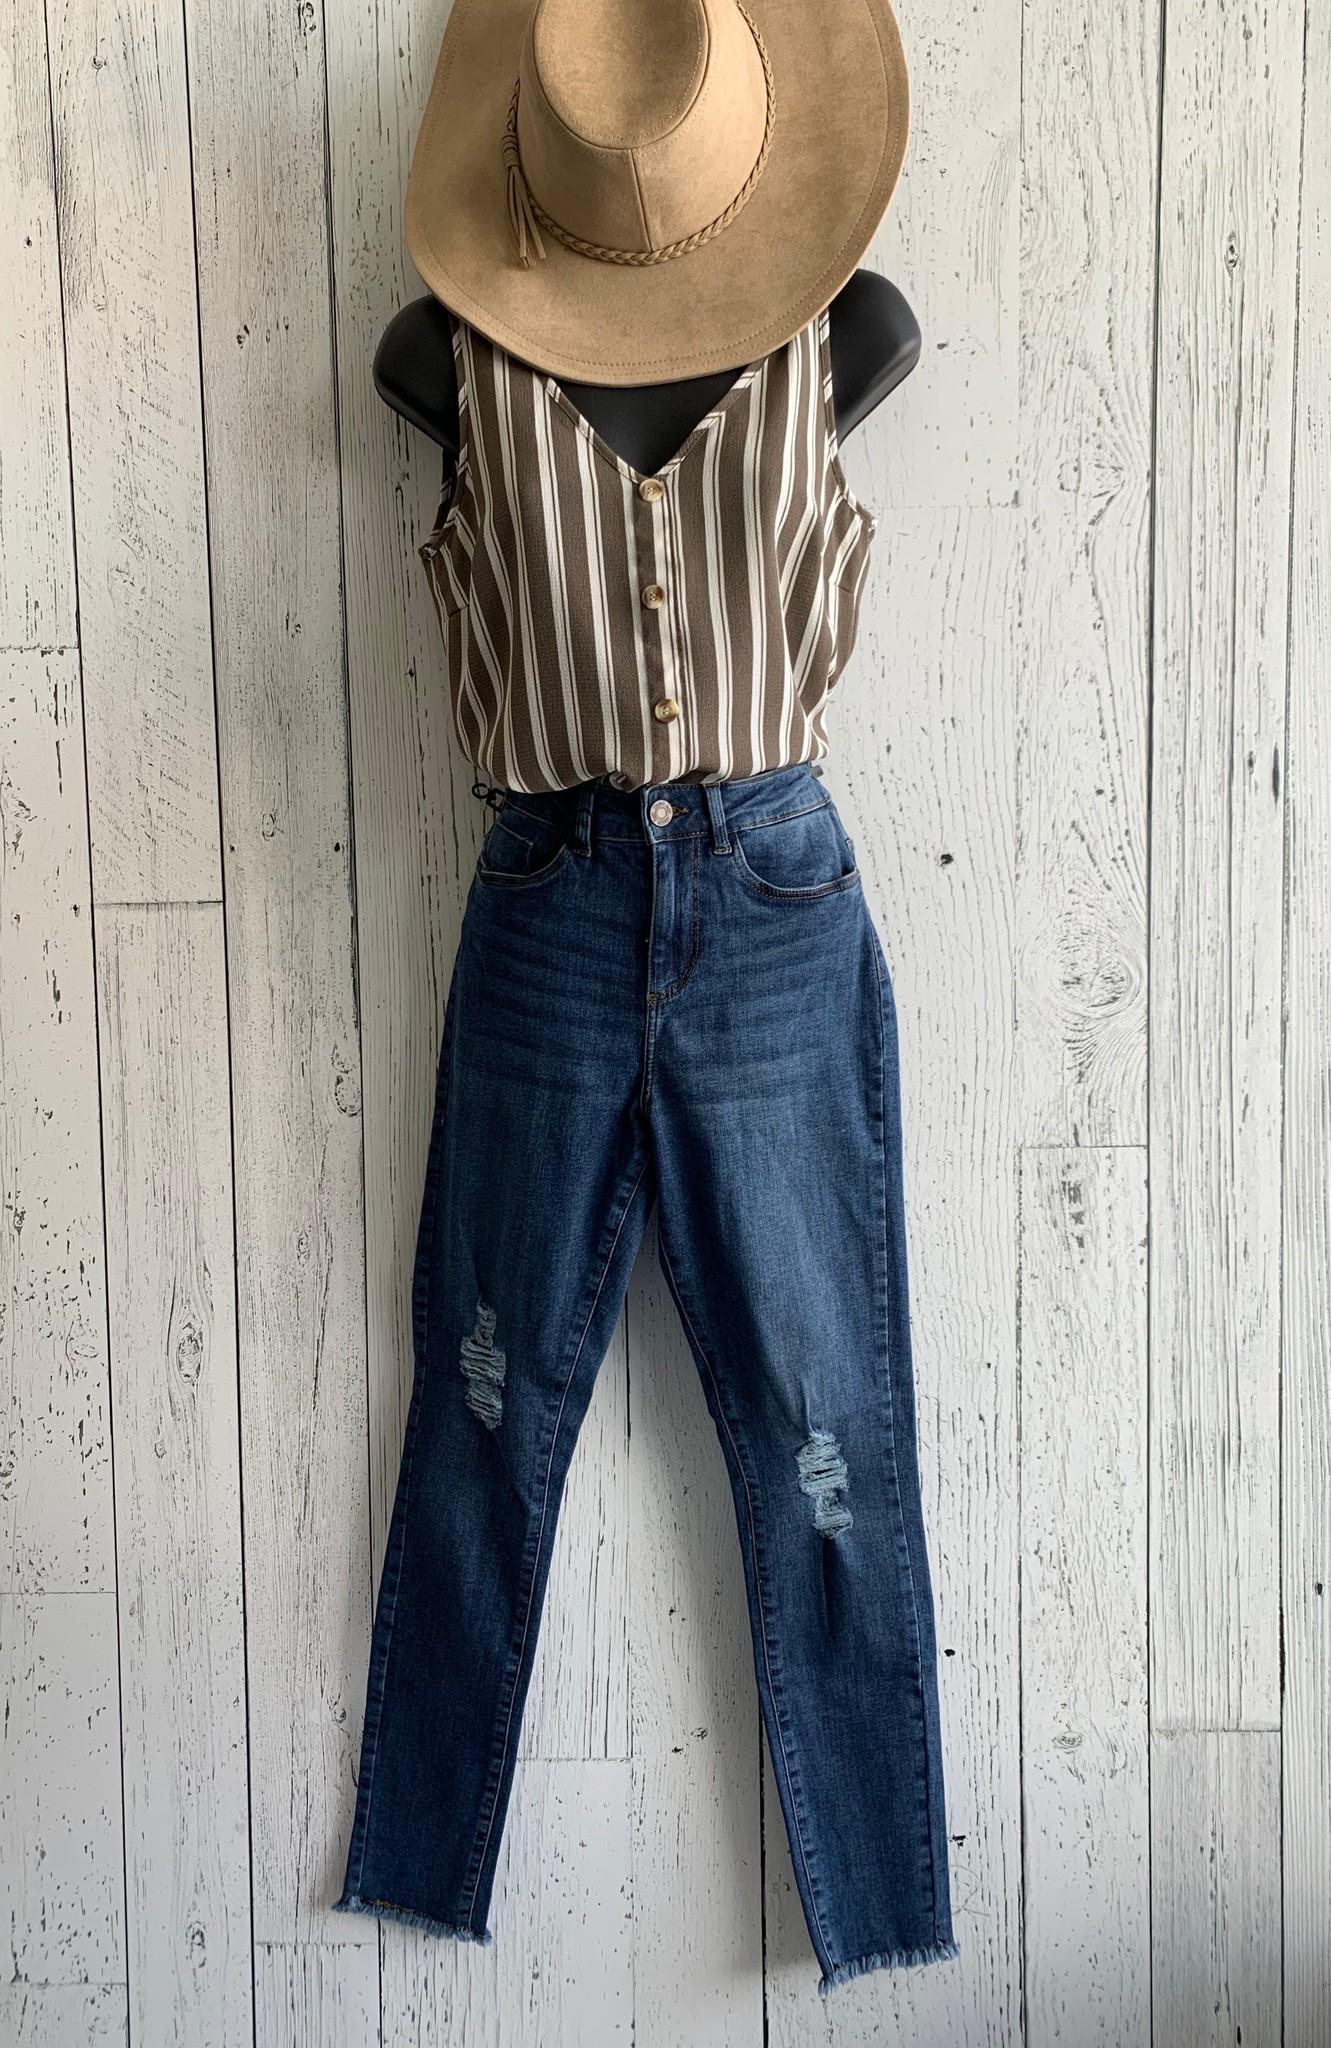 vero moda -striped wood  button top